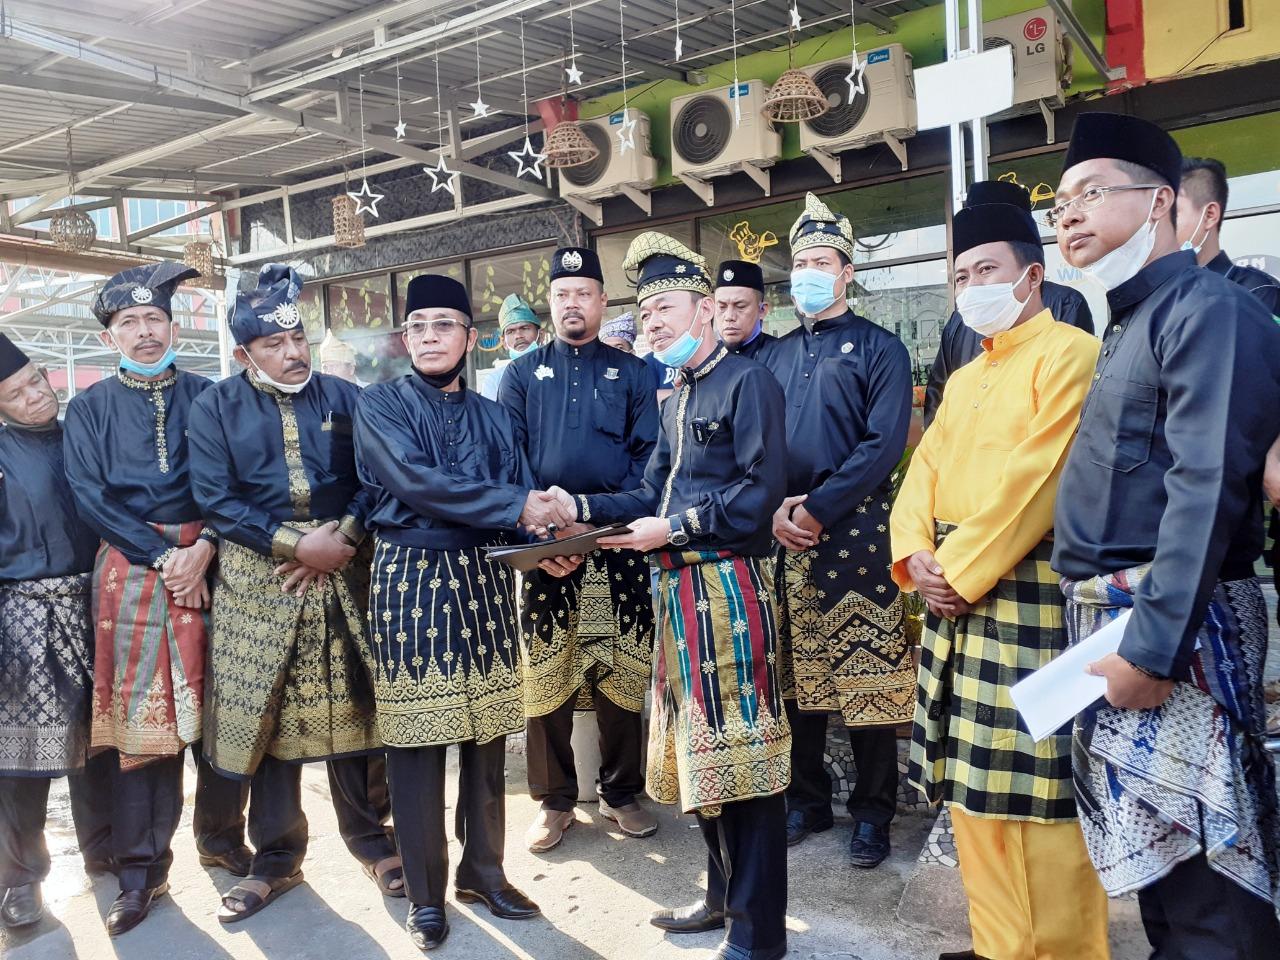 Pengelolaan Blok Rokan, Tokoh Adat Melayu di Rohil Sampaikan Tuntutan